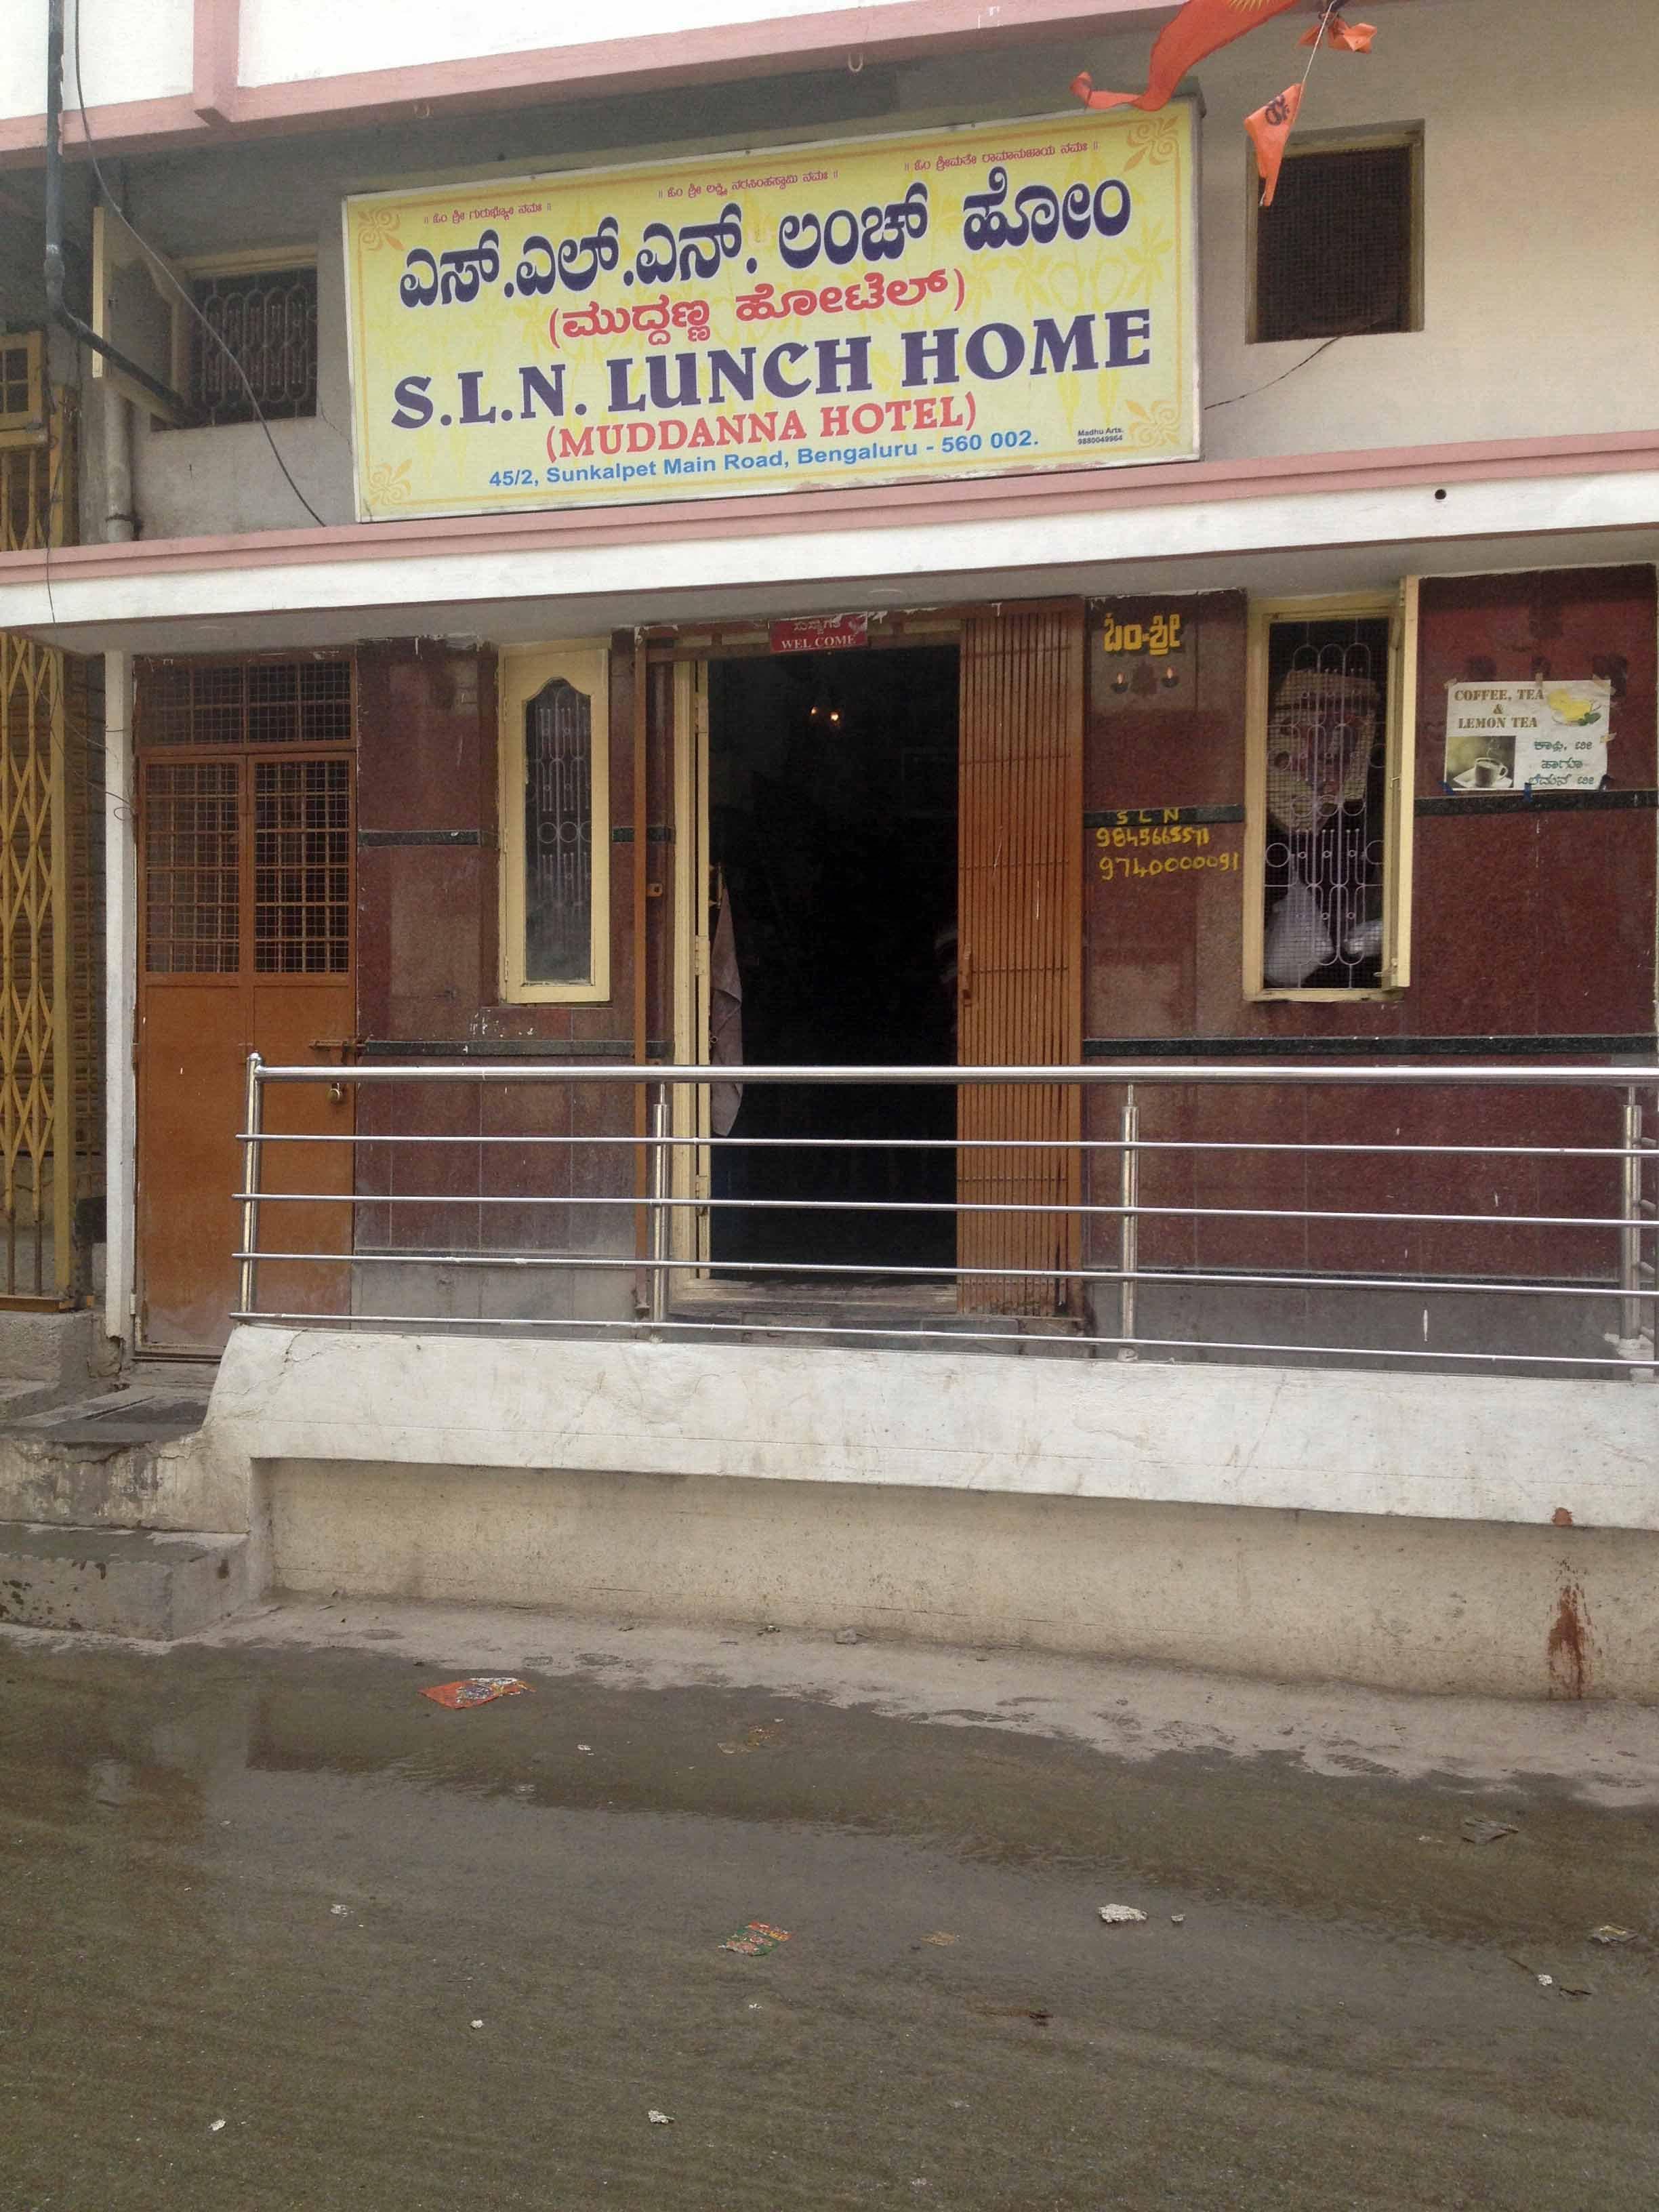 SLN Lunch Home (Muddanna Hotel) - Majestic - Bangalore Image